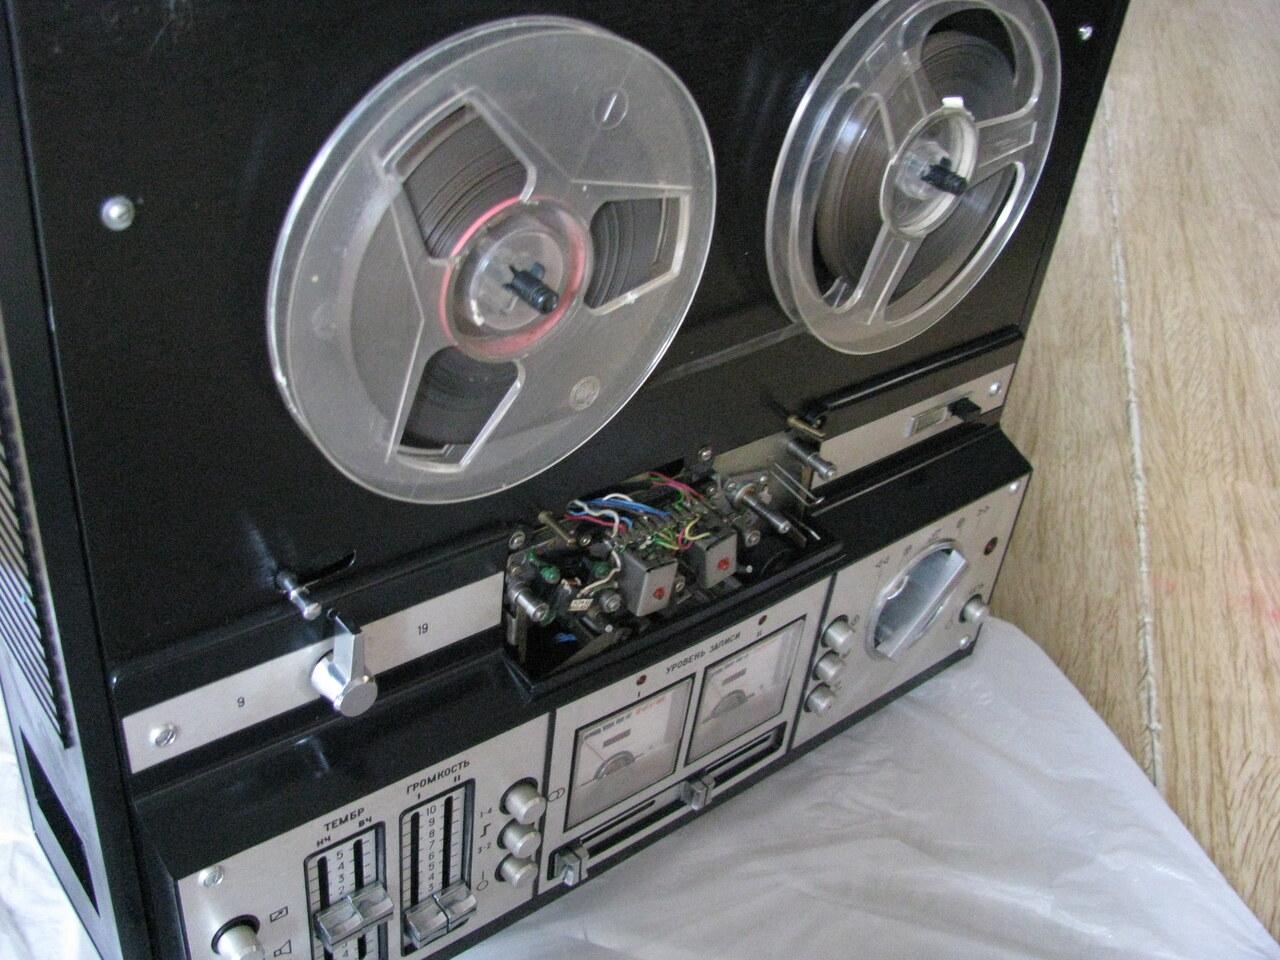 Катушечный магнитофон ''Астра-110-1-стерео''.